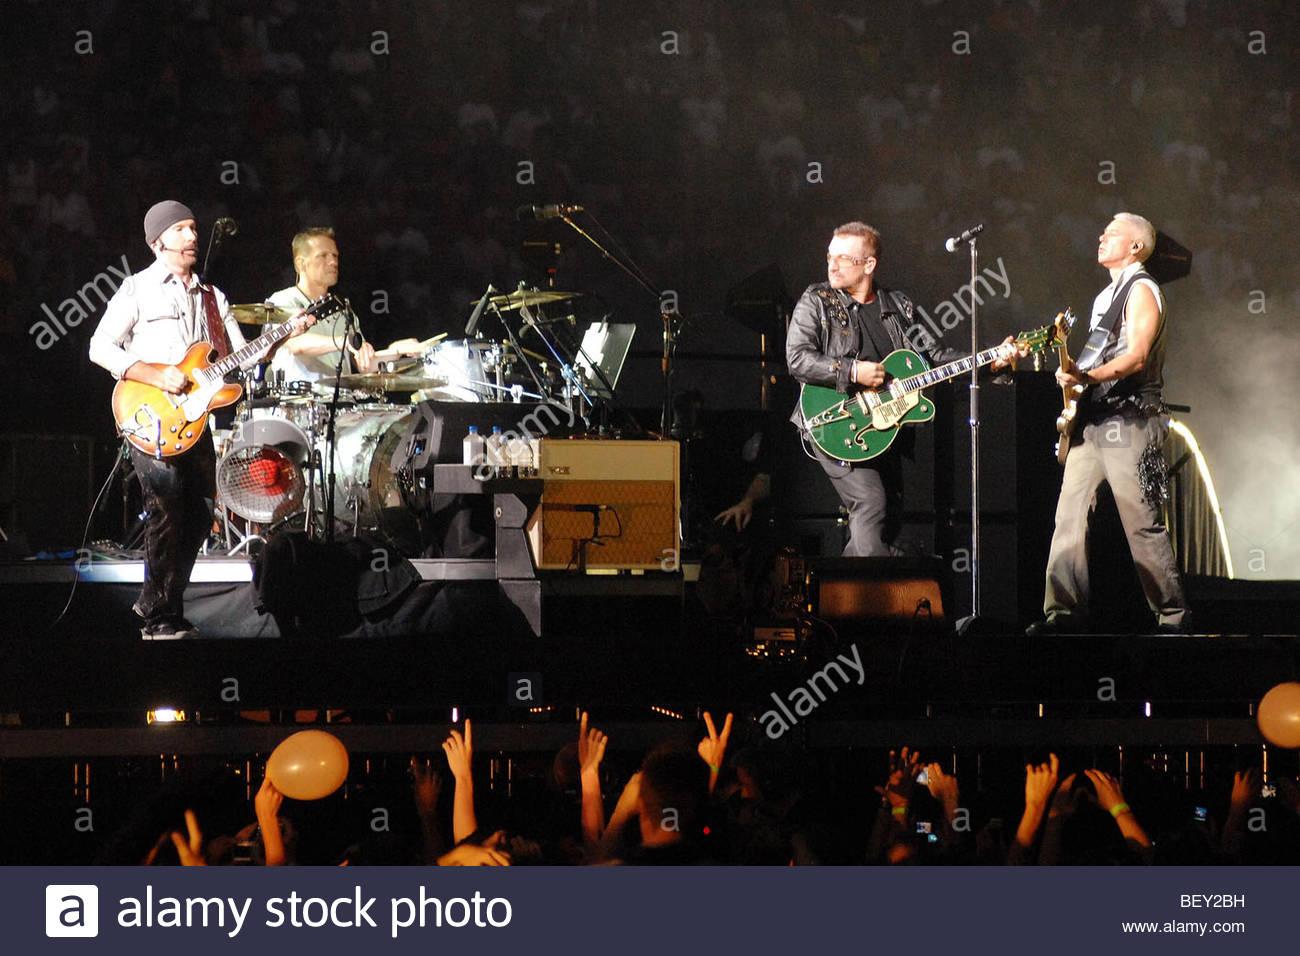 milano 2009, u2 in concert - Stock Image